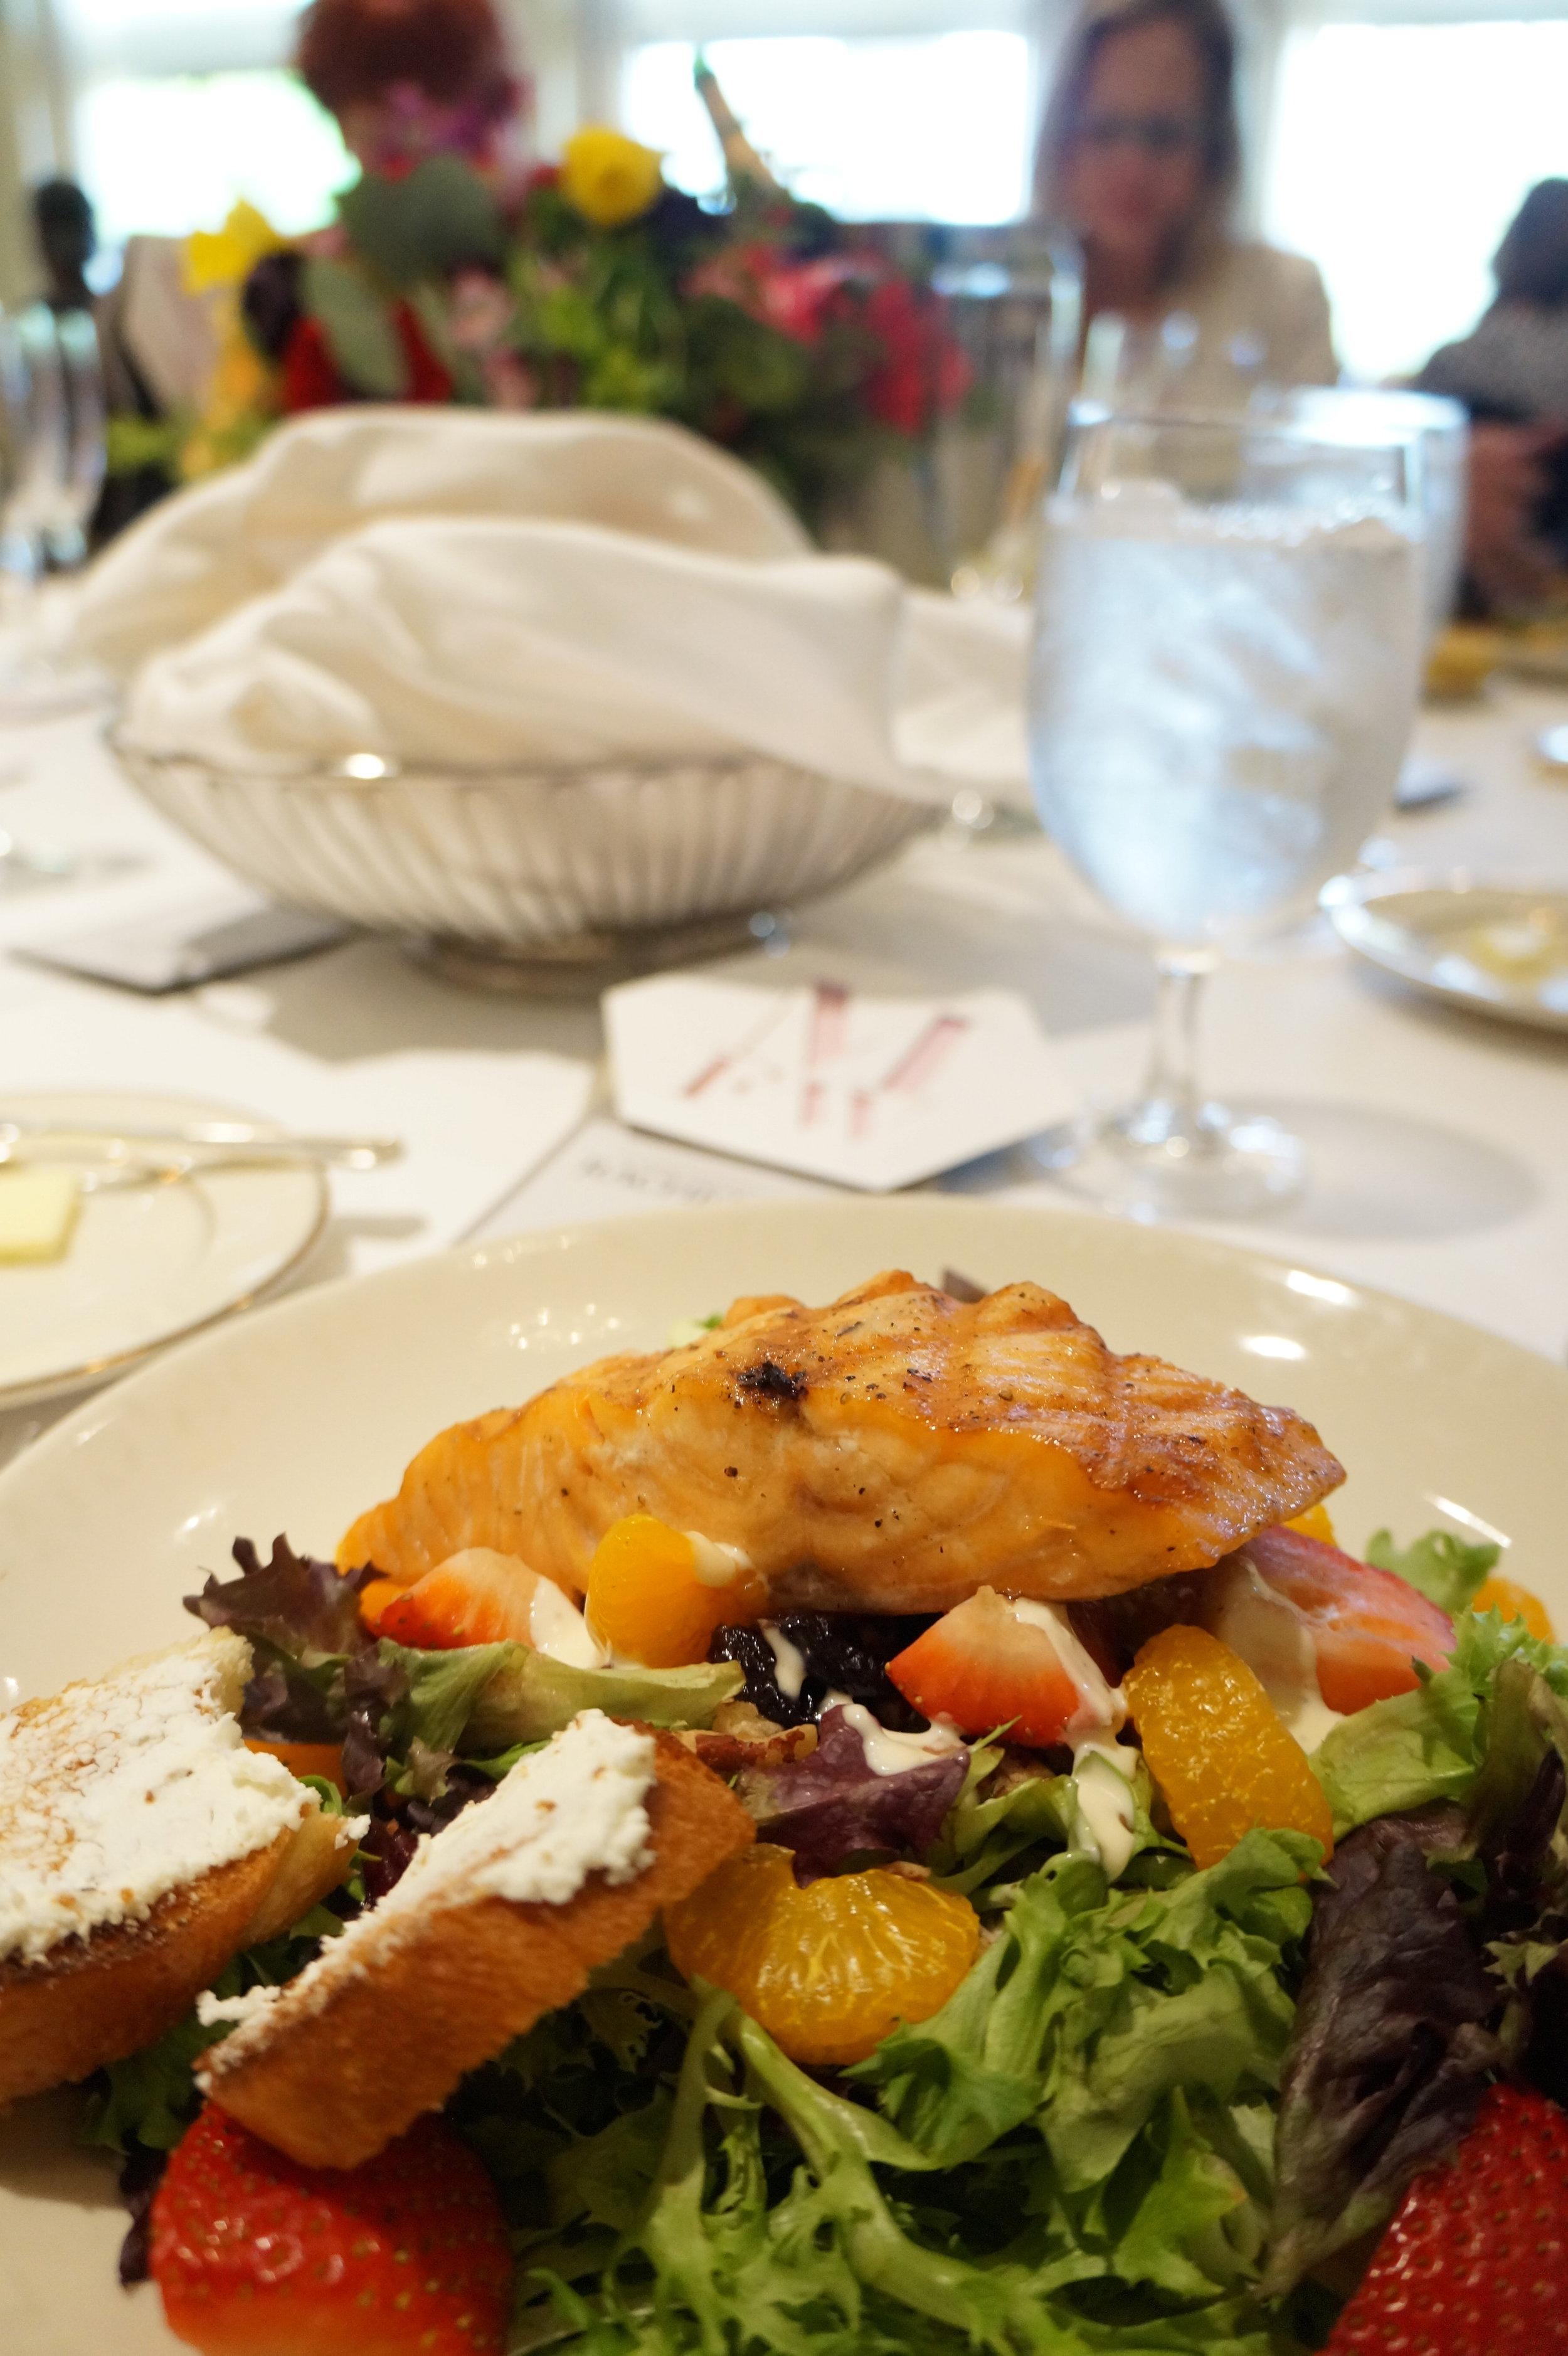 Andrea Fenise Memphis Fashion Blogger shares #memphisfashionweek headliner luncheon with Rachel Roy